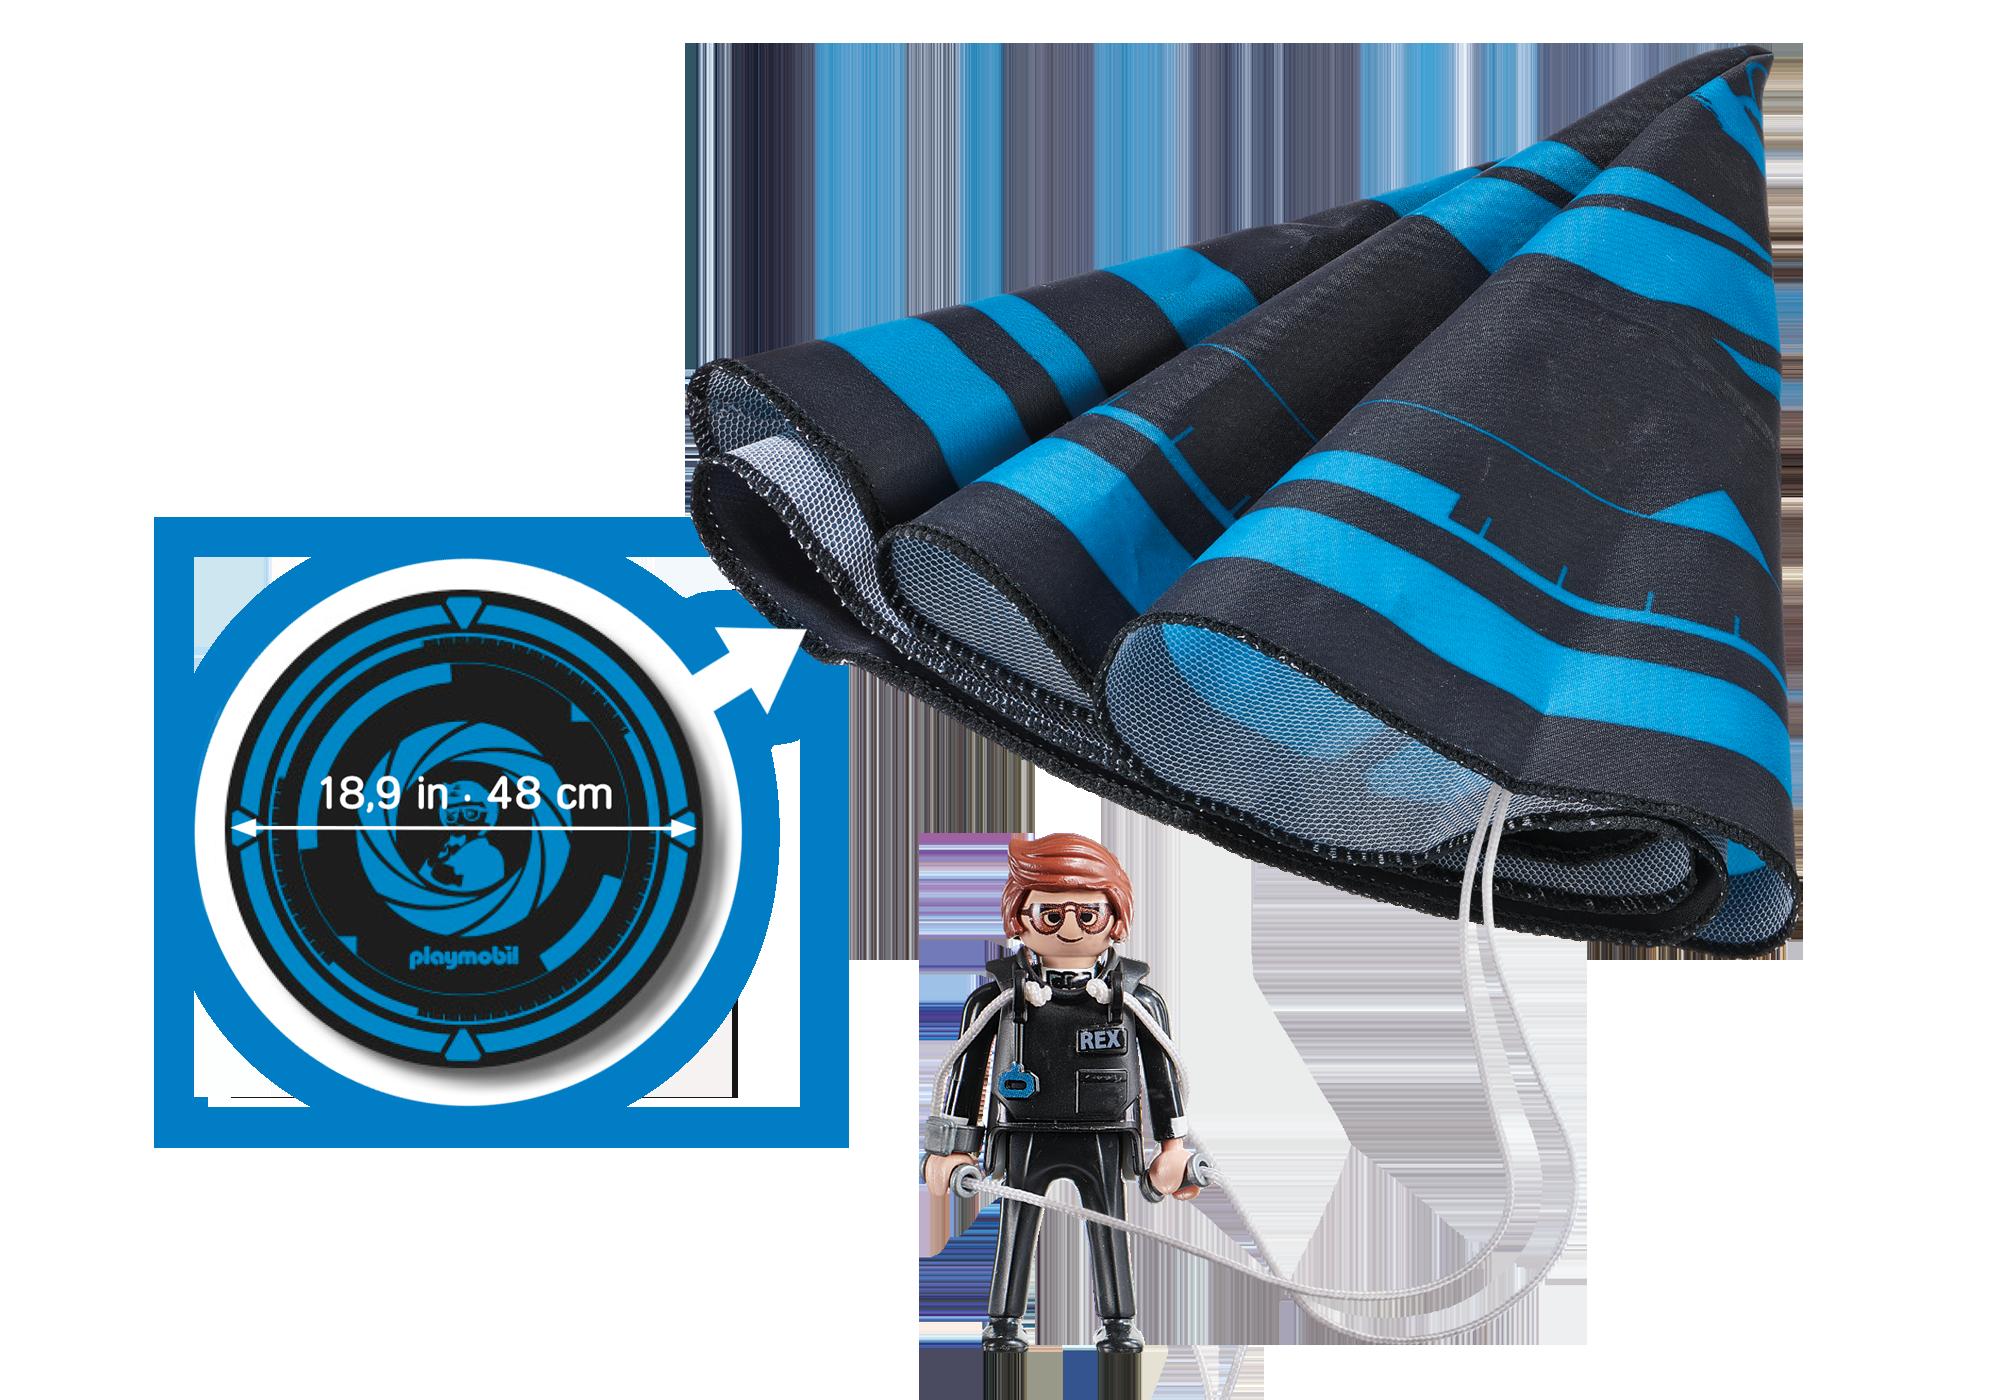 http://media.playmobil.com/i/playmobil/70070_product_box_back/PLAYMOBIL:THE MOVIE Rex Dasher with Parachute